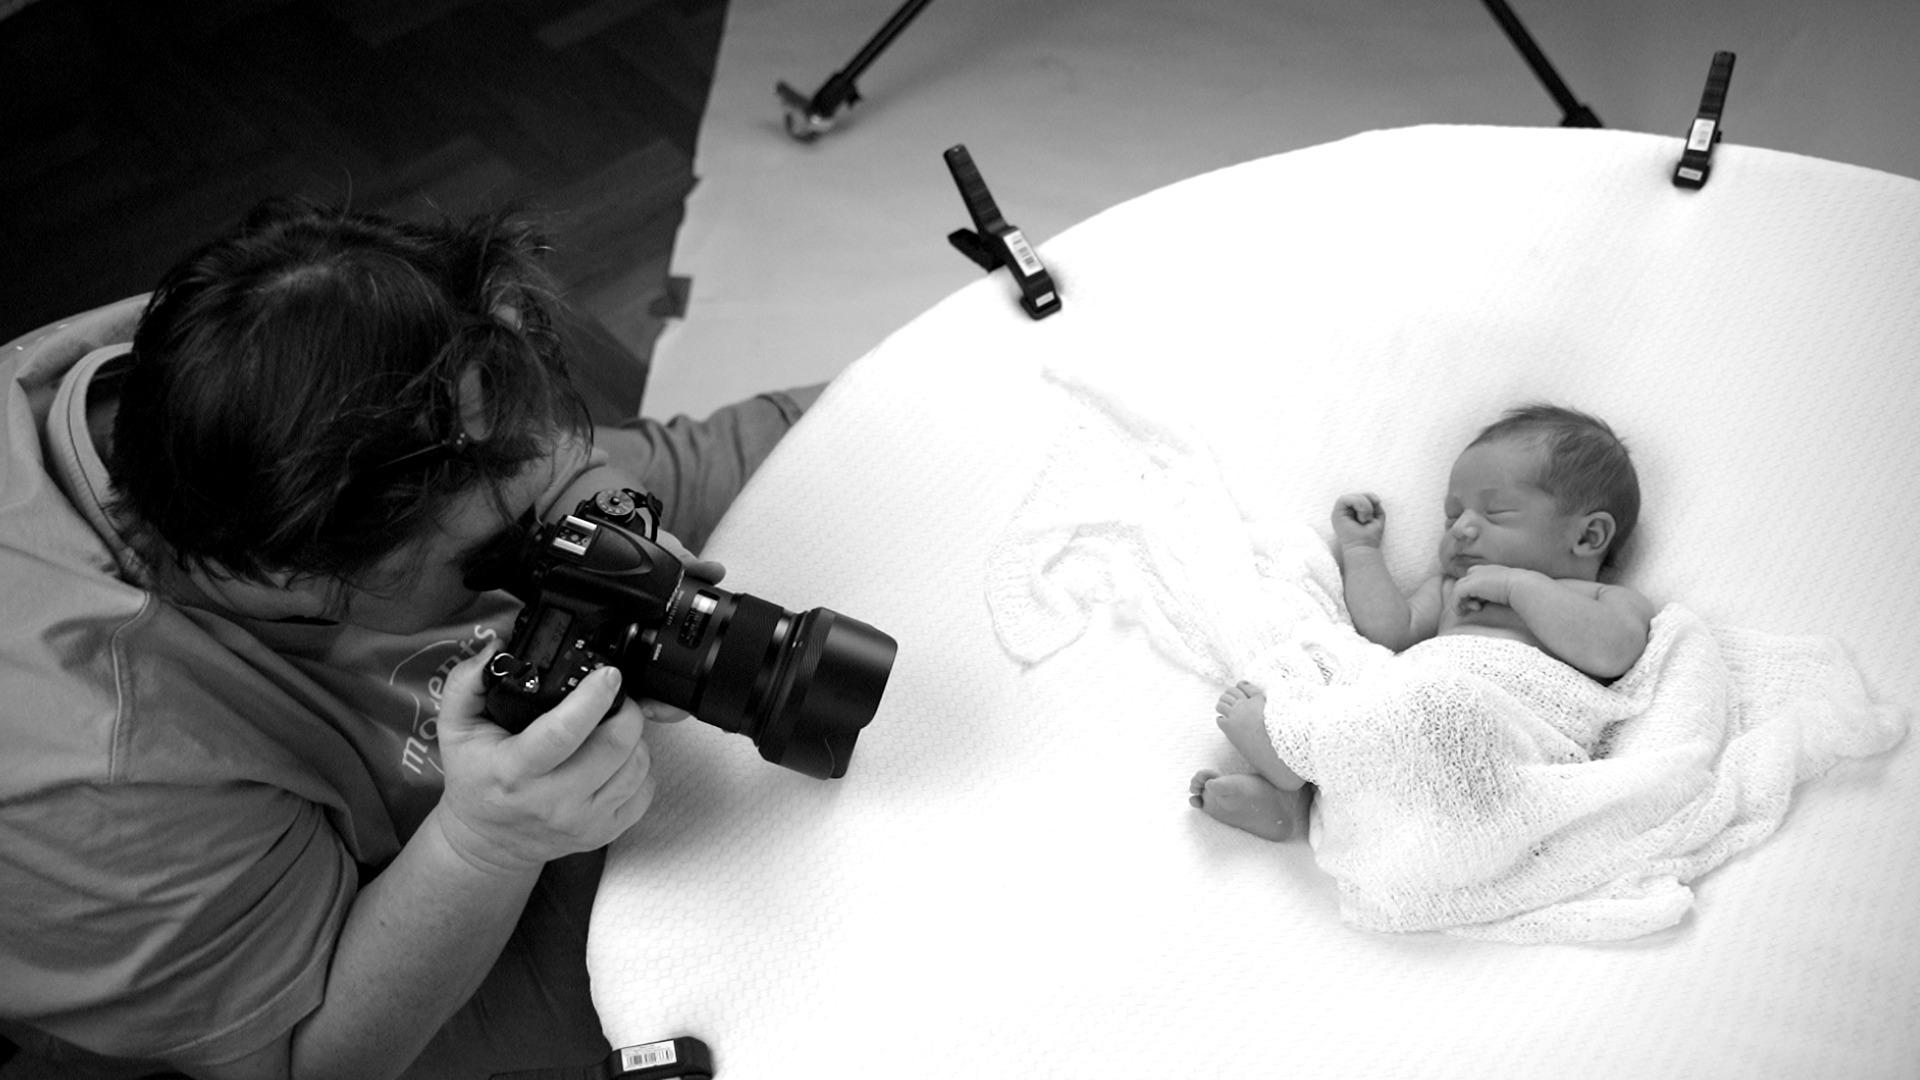 Werbefilm - Mole